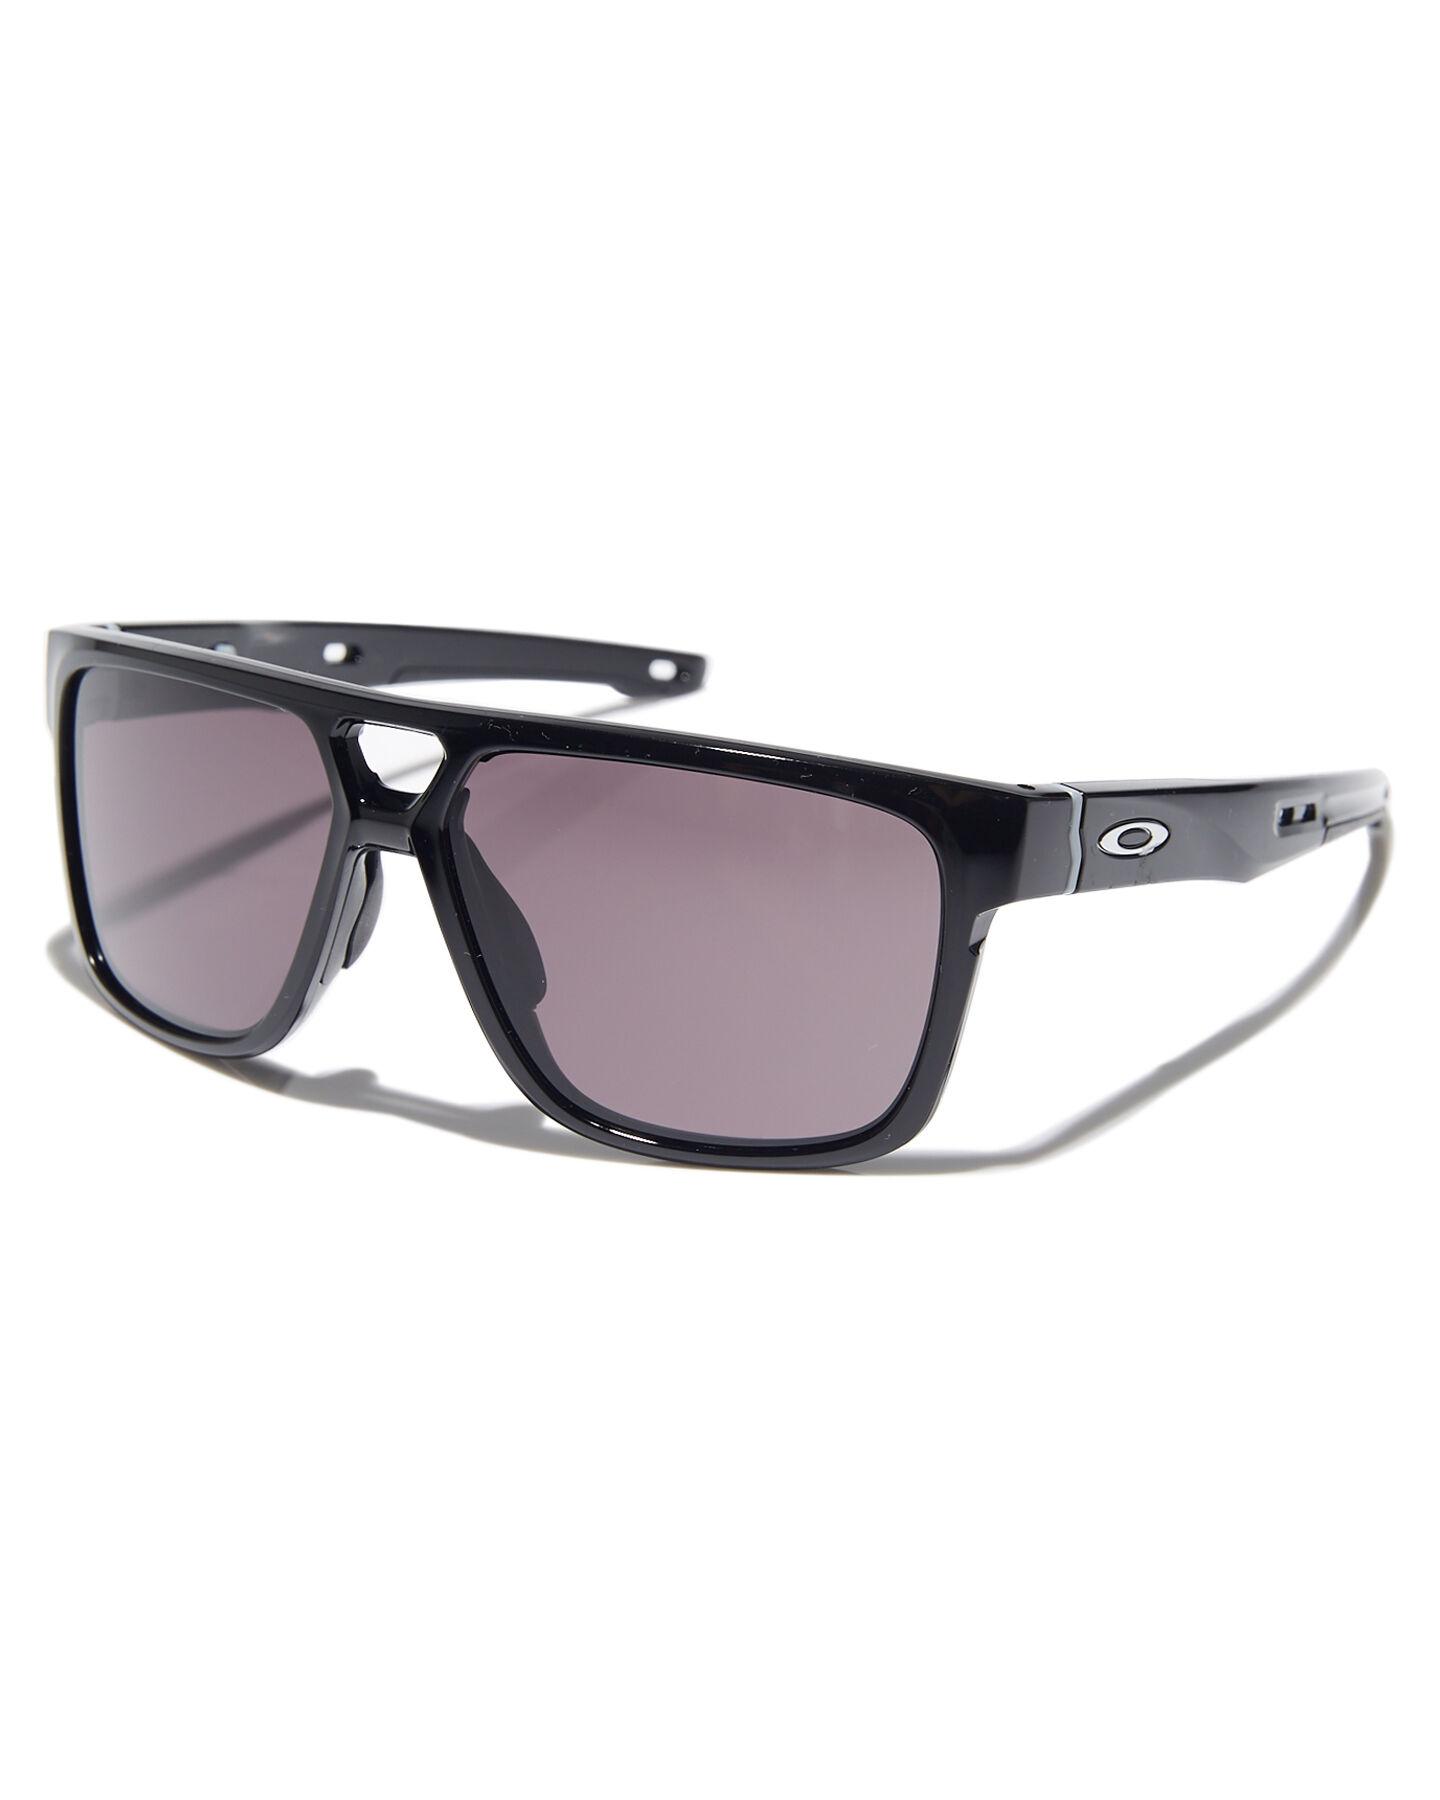 9ff39c2f6ed ... czech black warm grey mens accessories oakley sunglasses oo9382  0160blkgy f026e 6af03